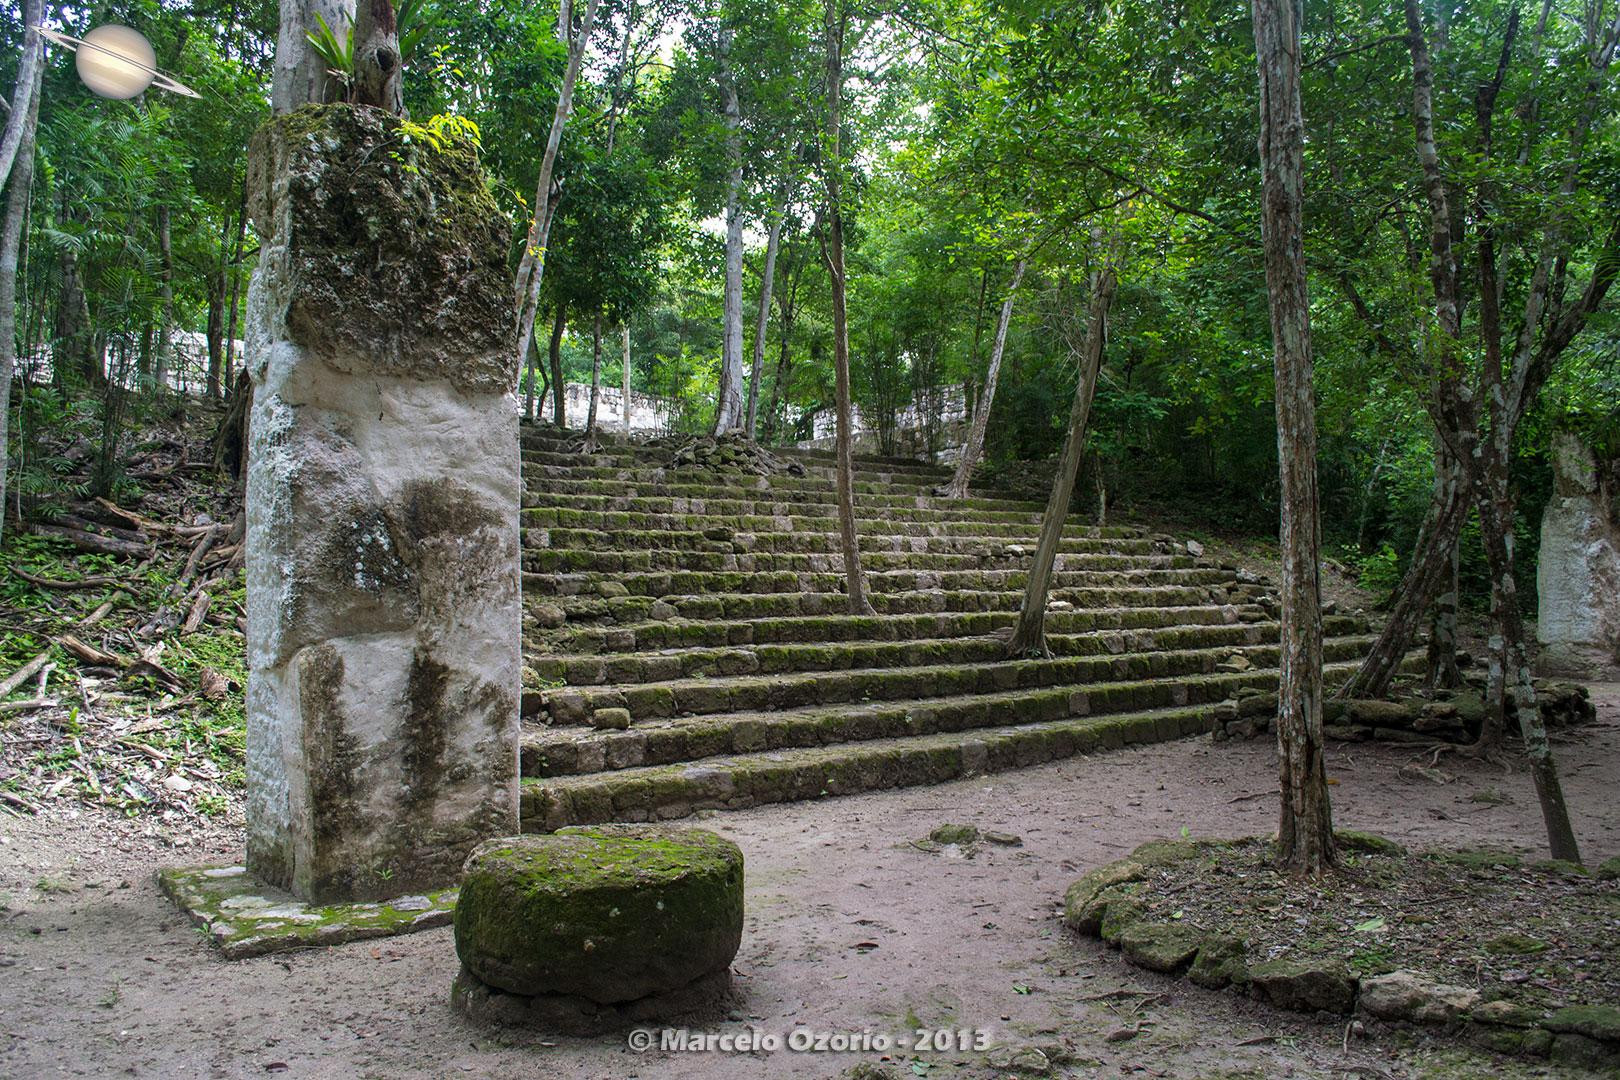 calakmul mayan civilization mexico 2 - Calakmul, City of the Two Adjacent Pyramids - Mexico